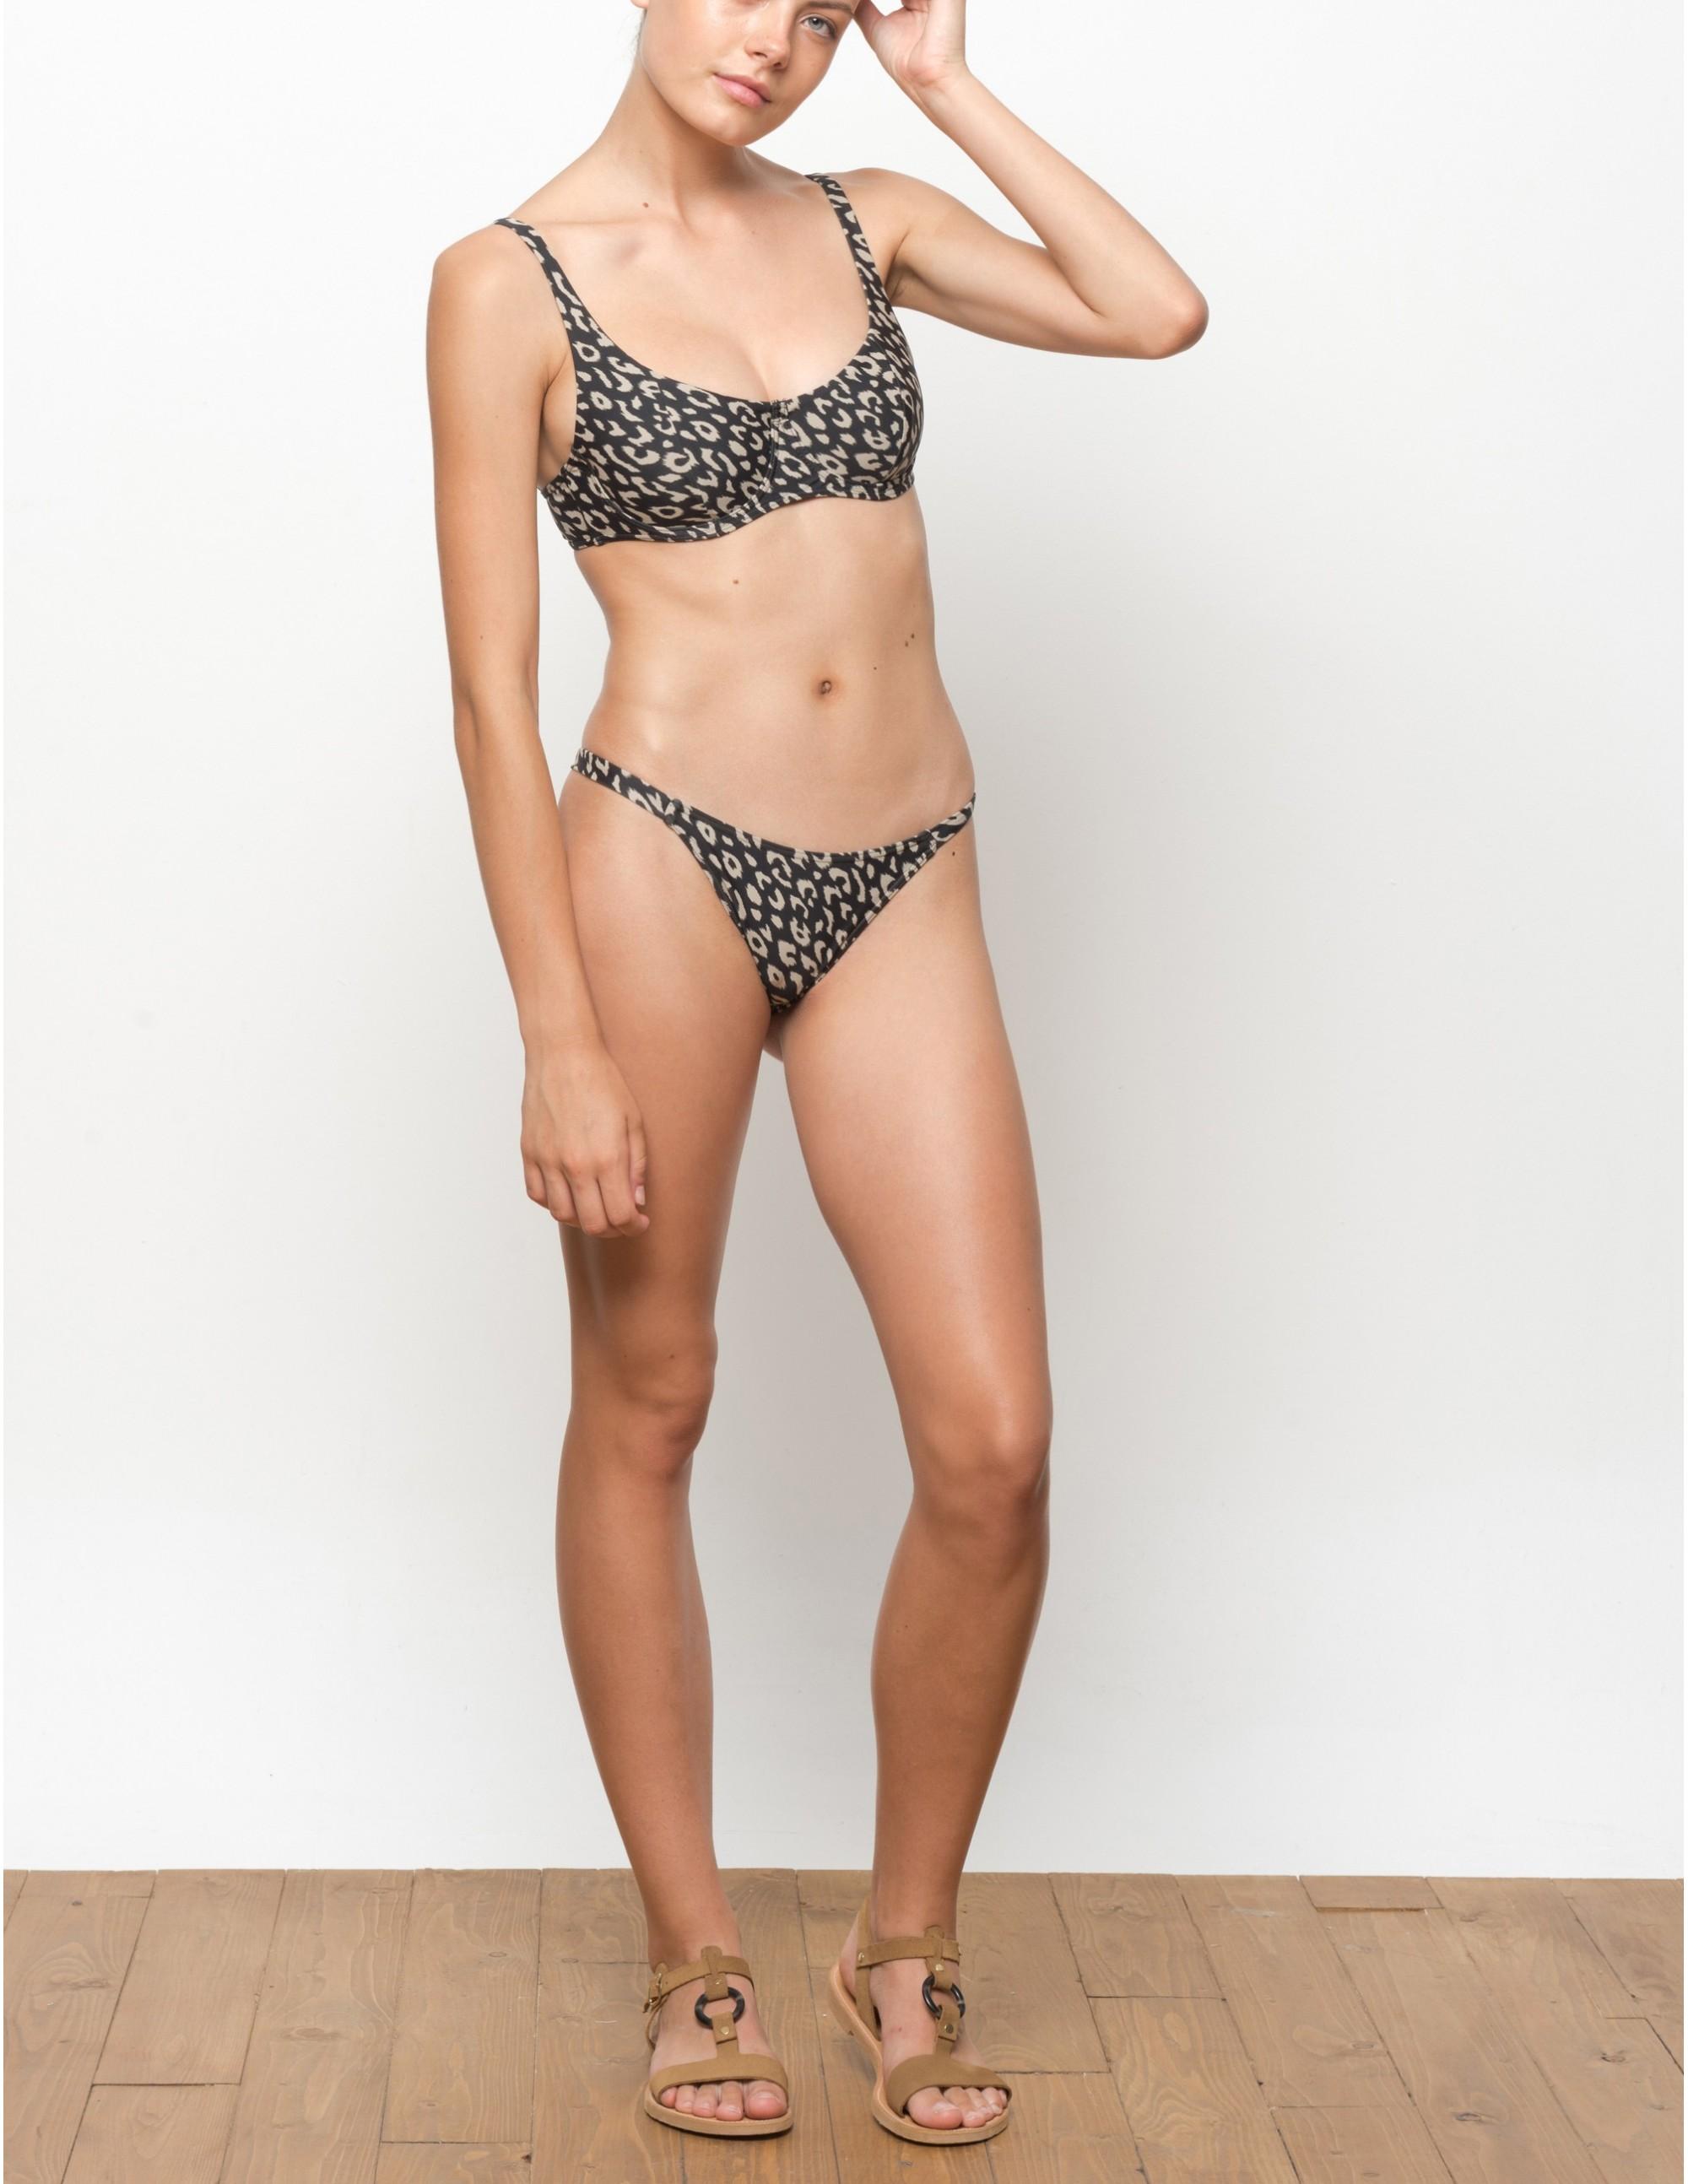 KIGO bikini top - LEOPARD